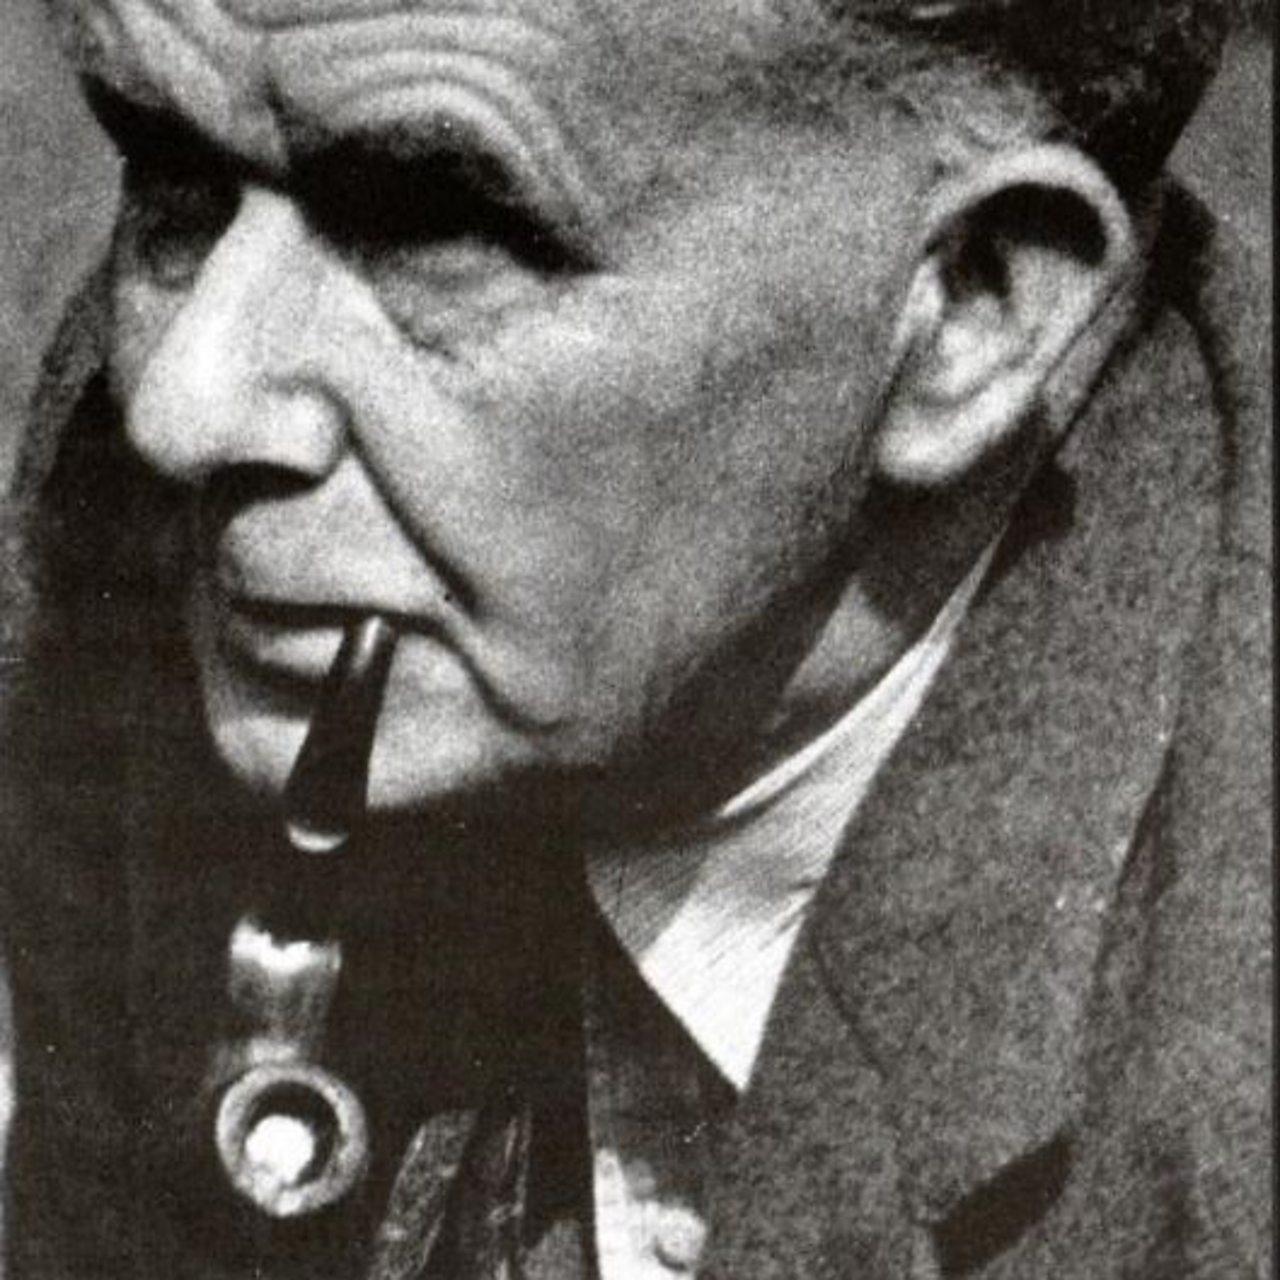 Photograph of the potato breeder John Clarke